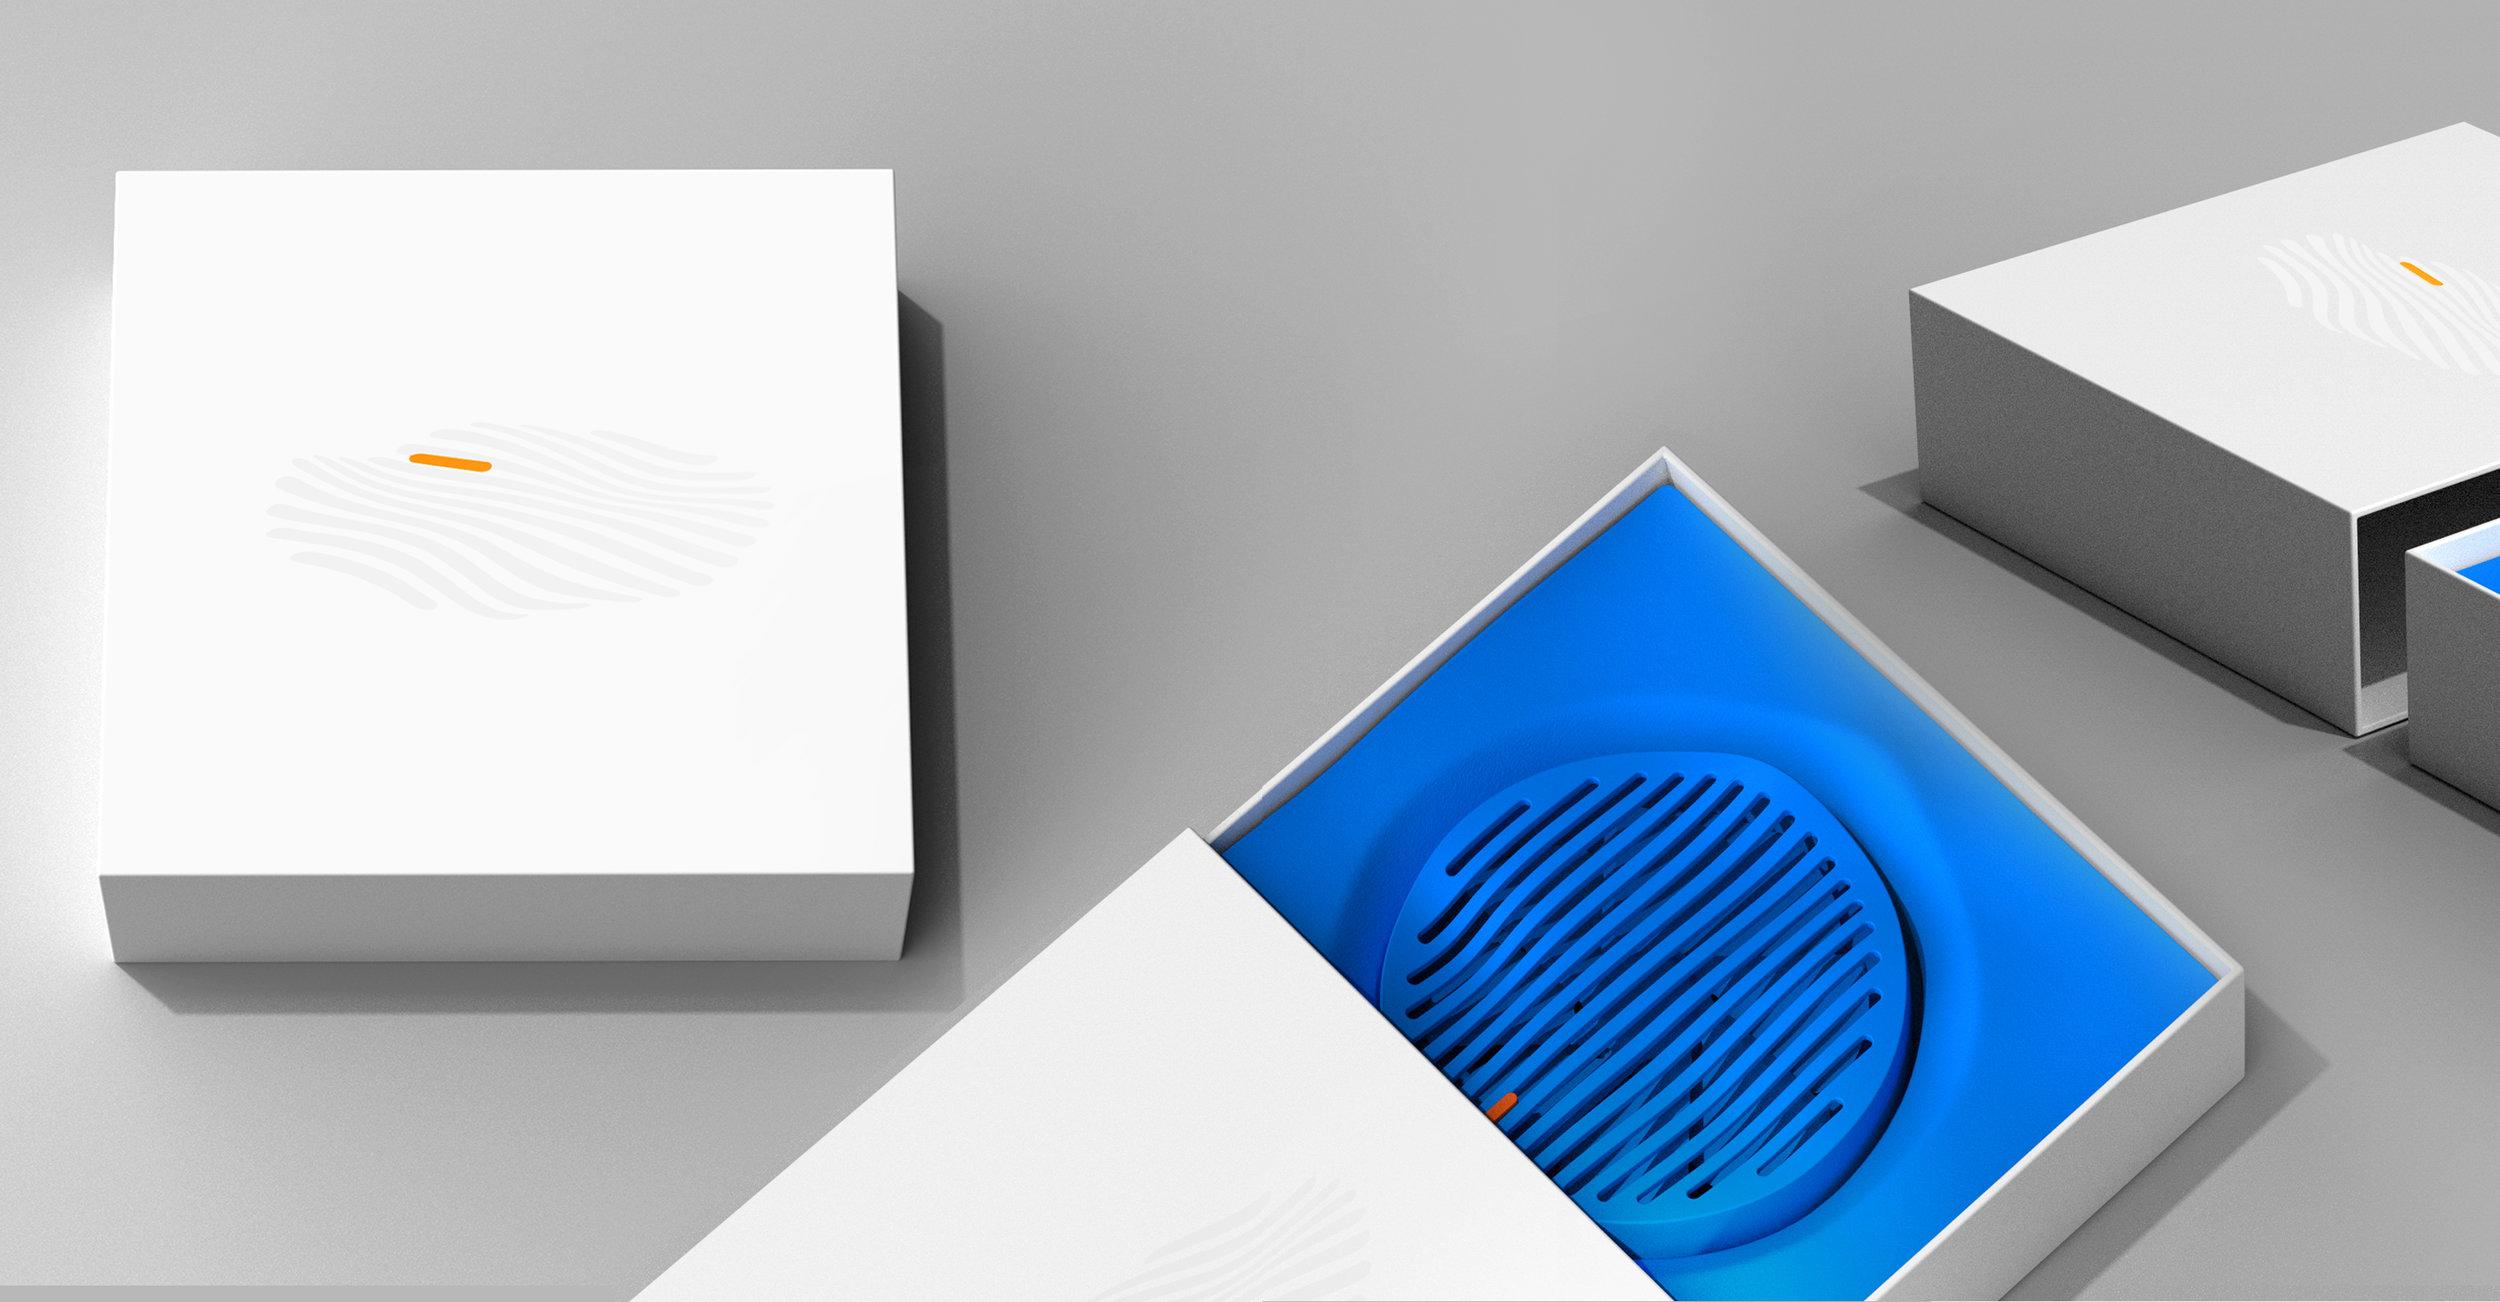 _blowing-with-cs-deskfan-hoang-industrialdesign_3.jpg